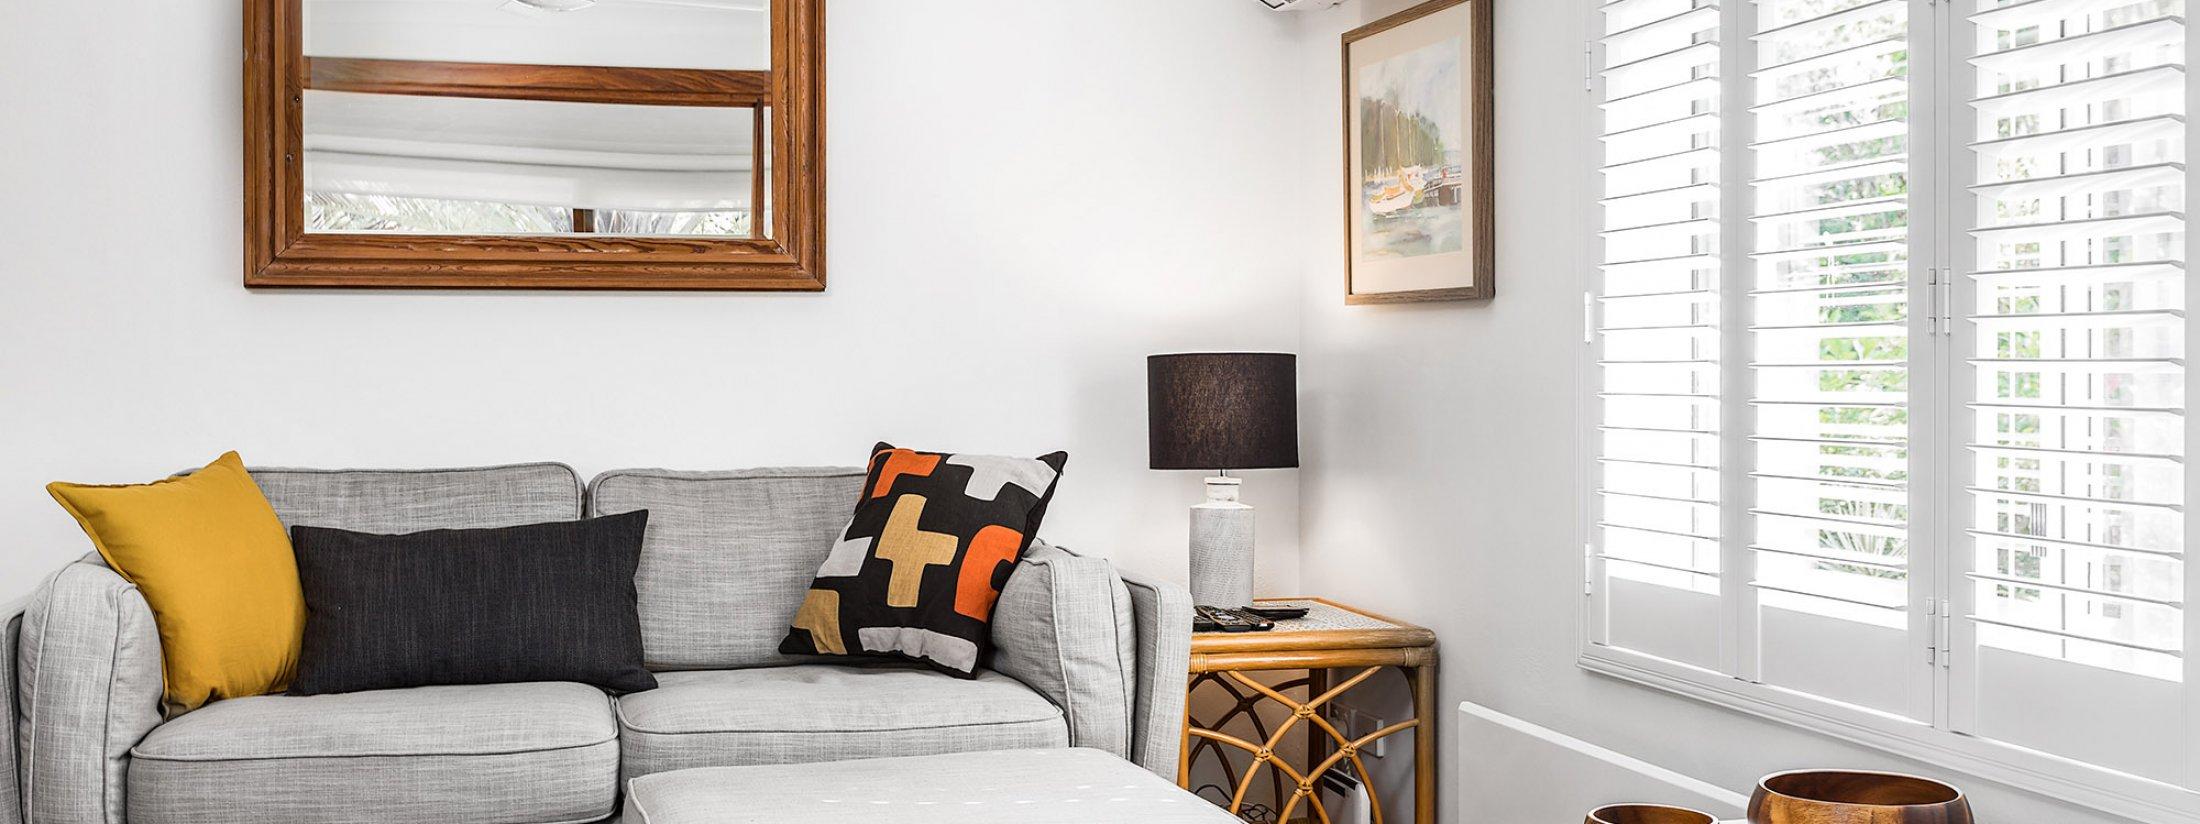 Little Geckos - Byron Bay - Living Room a